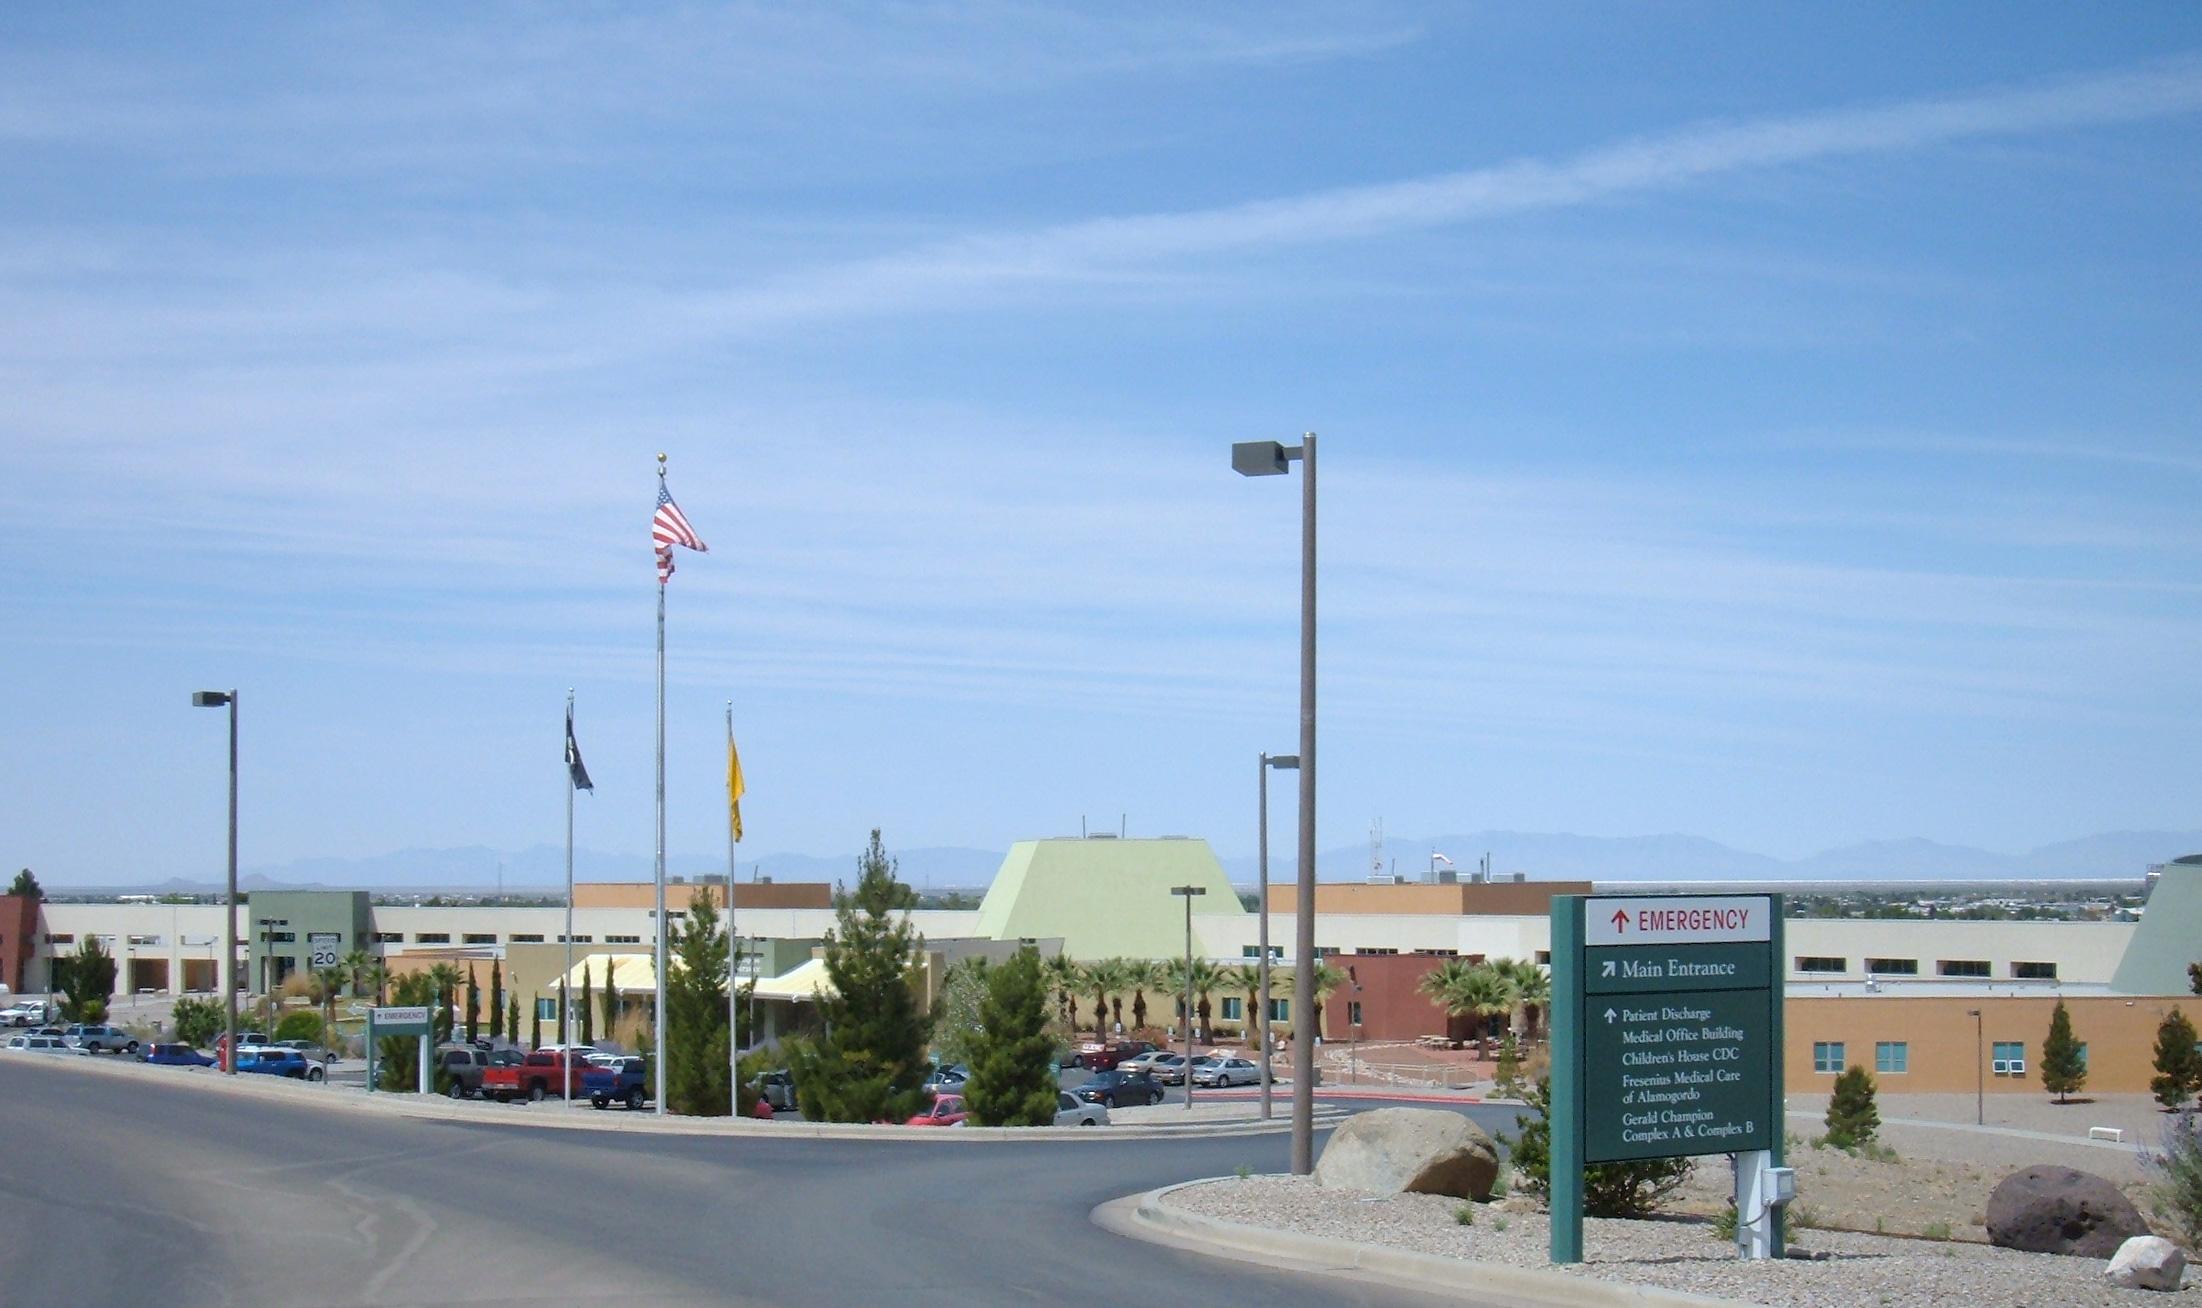 Gerald Champion Regional Medical Center Emergency Room